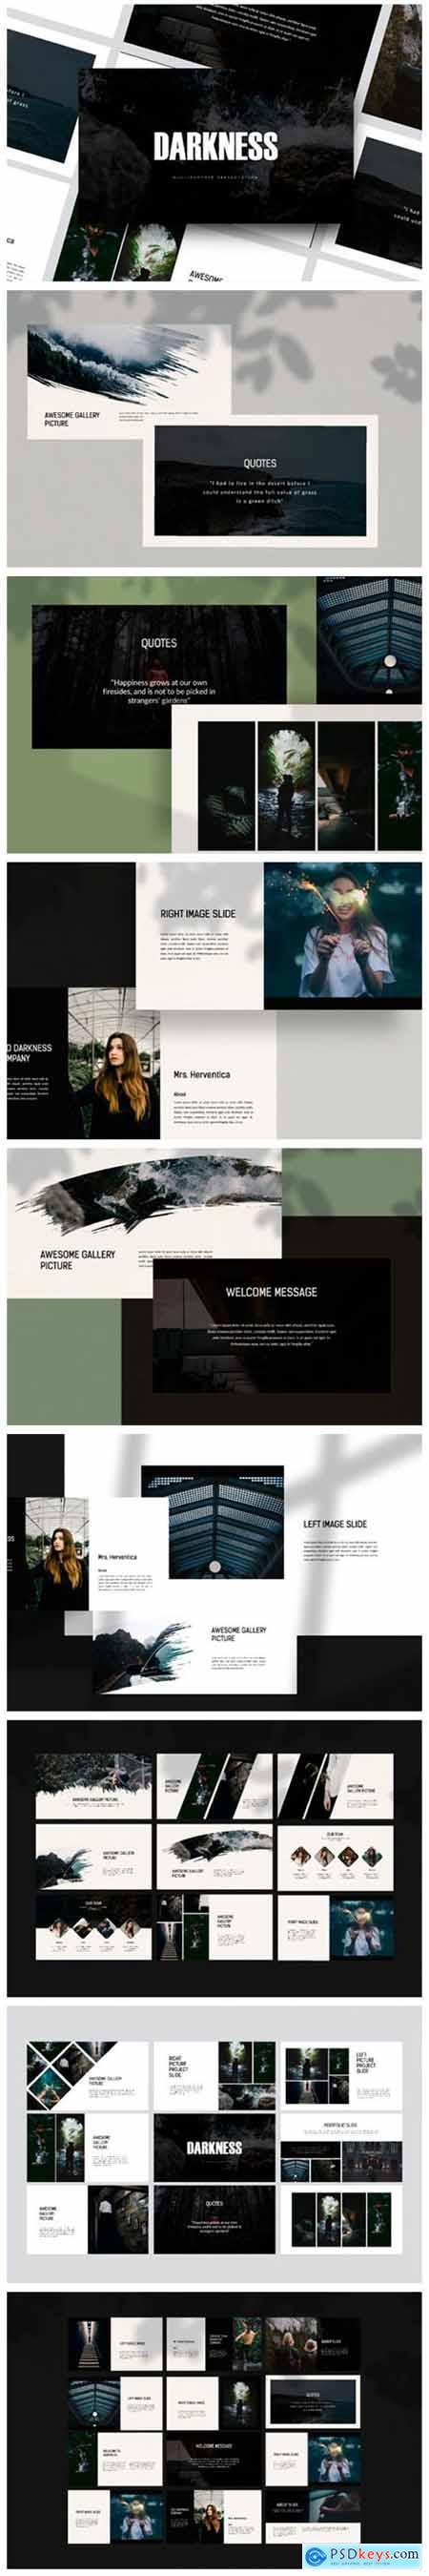 Darkness - Google Slides Template 2276723